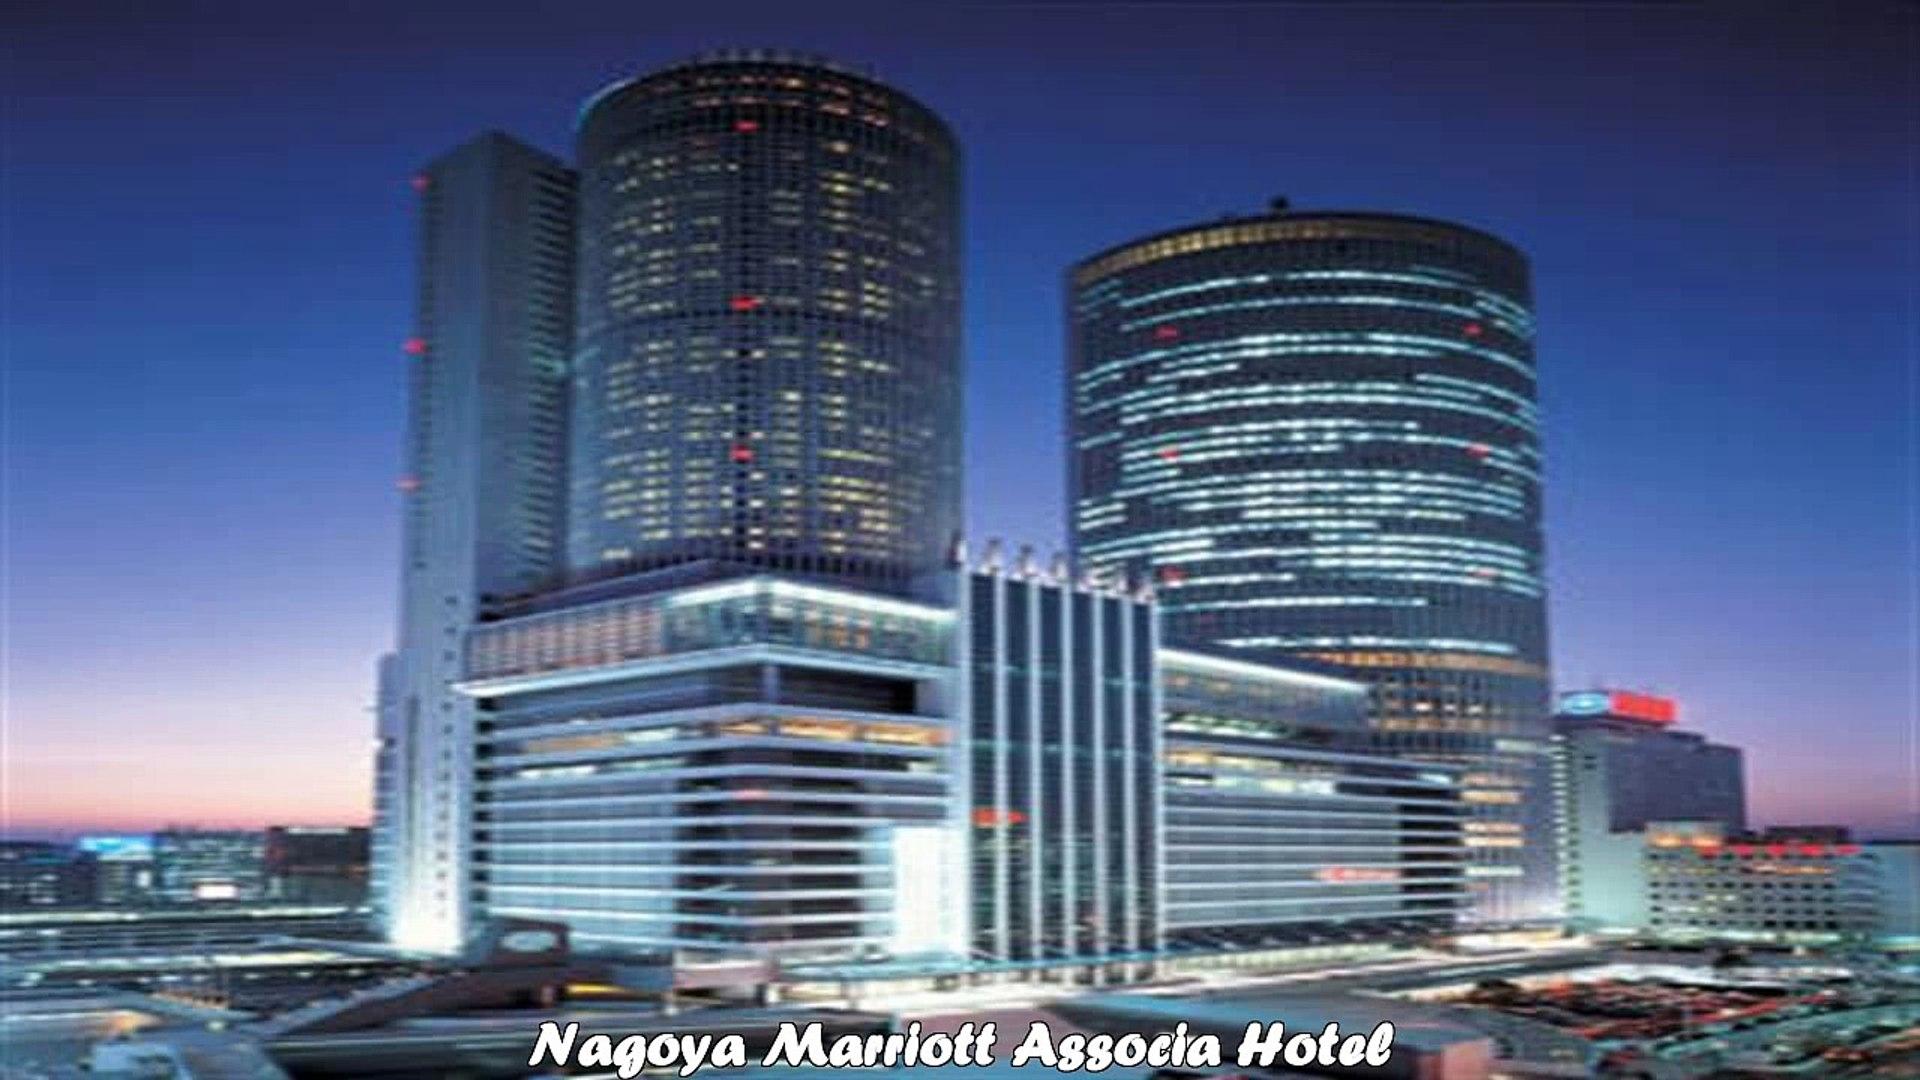 Hotels in Nagoya Nagoya Marriott Associa Hotel Japan